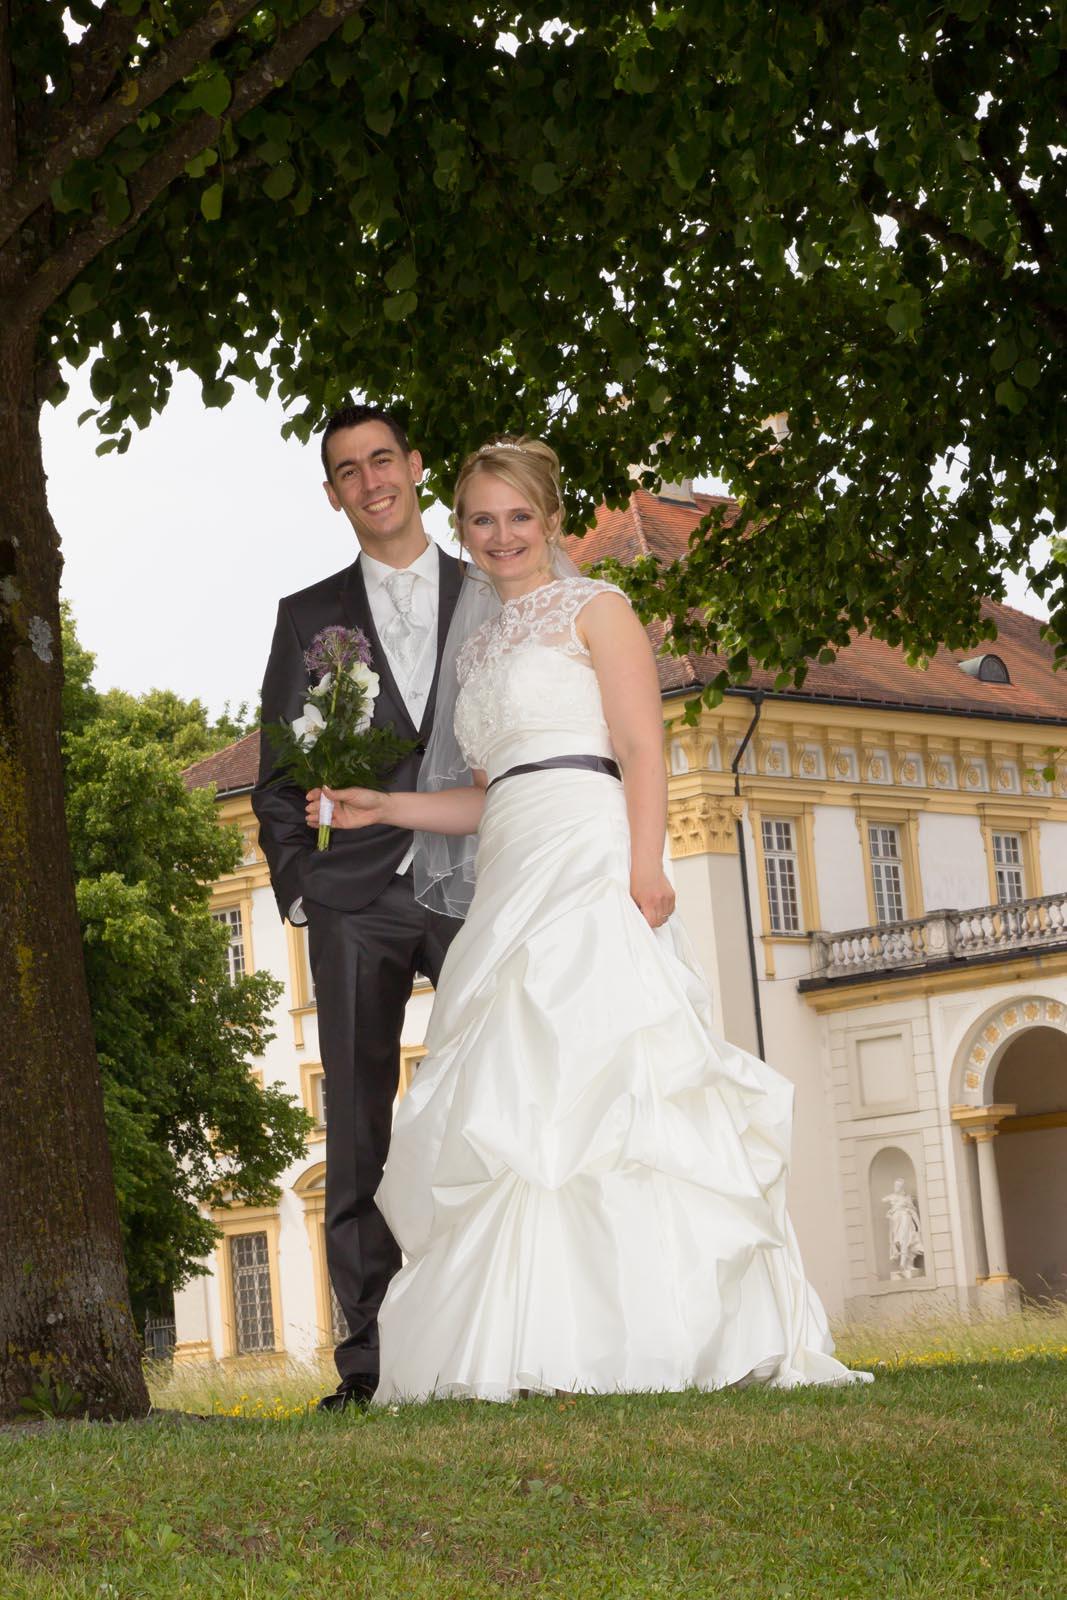 Hochzeit-Portraits-Jacob-Kirche-Hochzeit-Jacob-7181.jpg